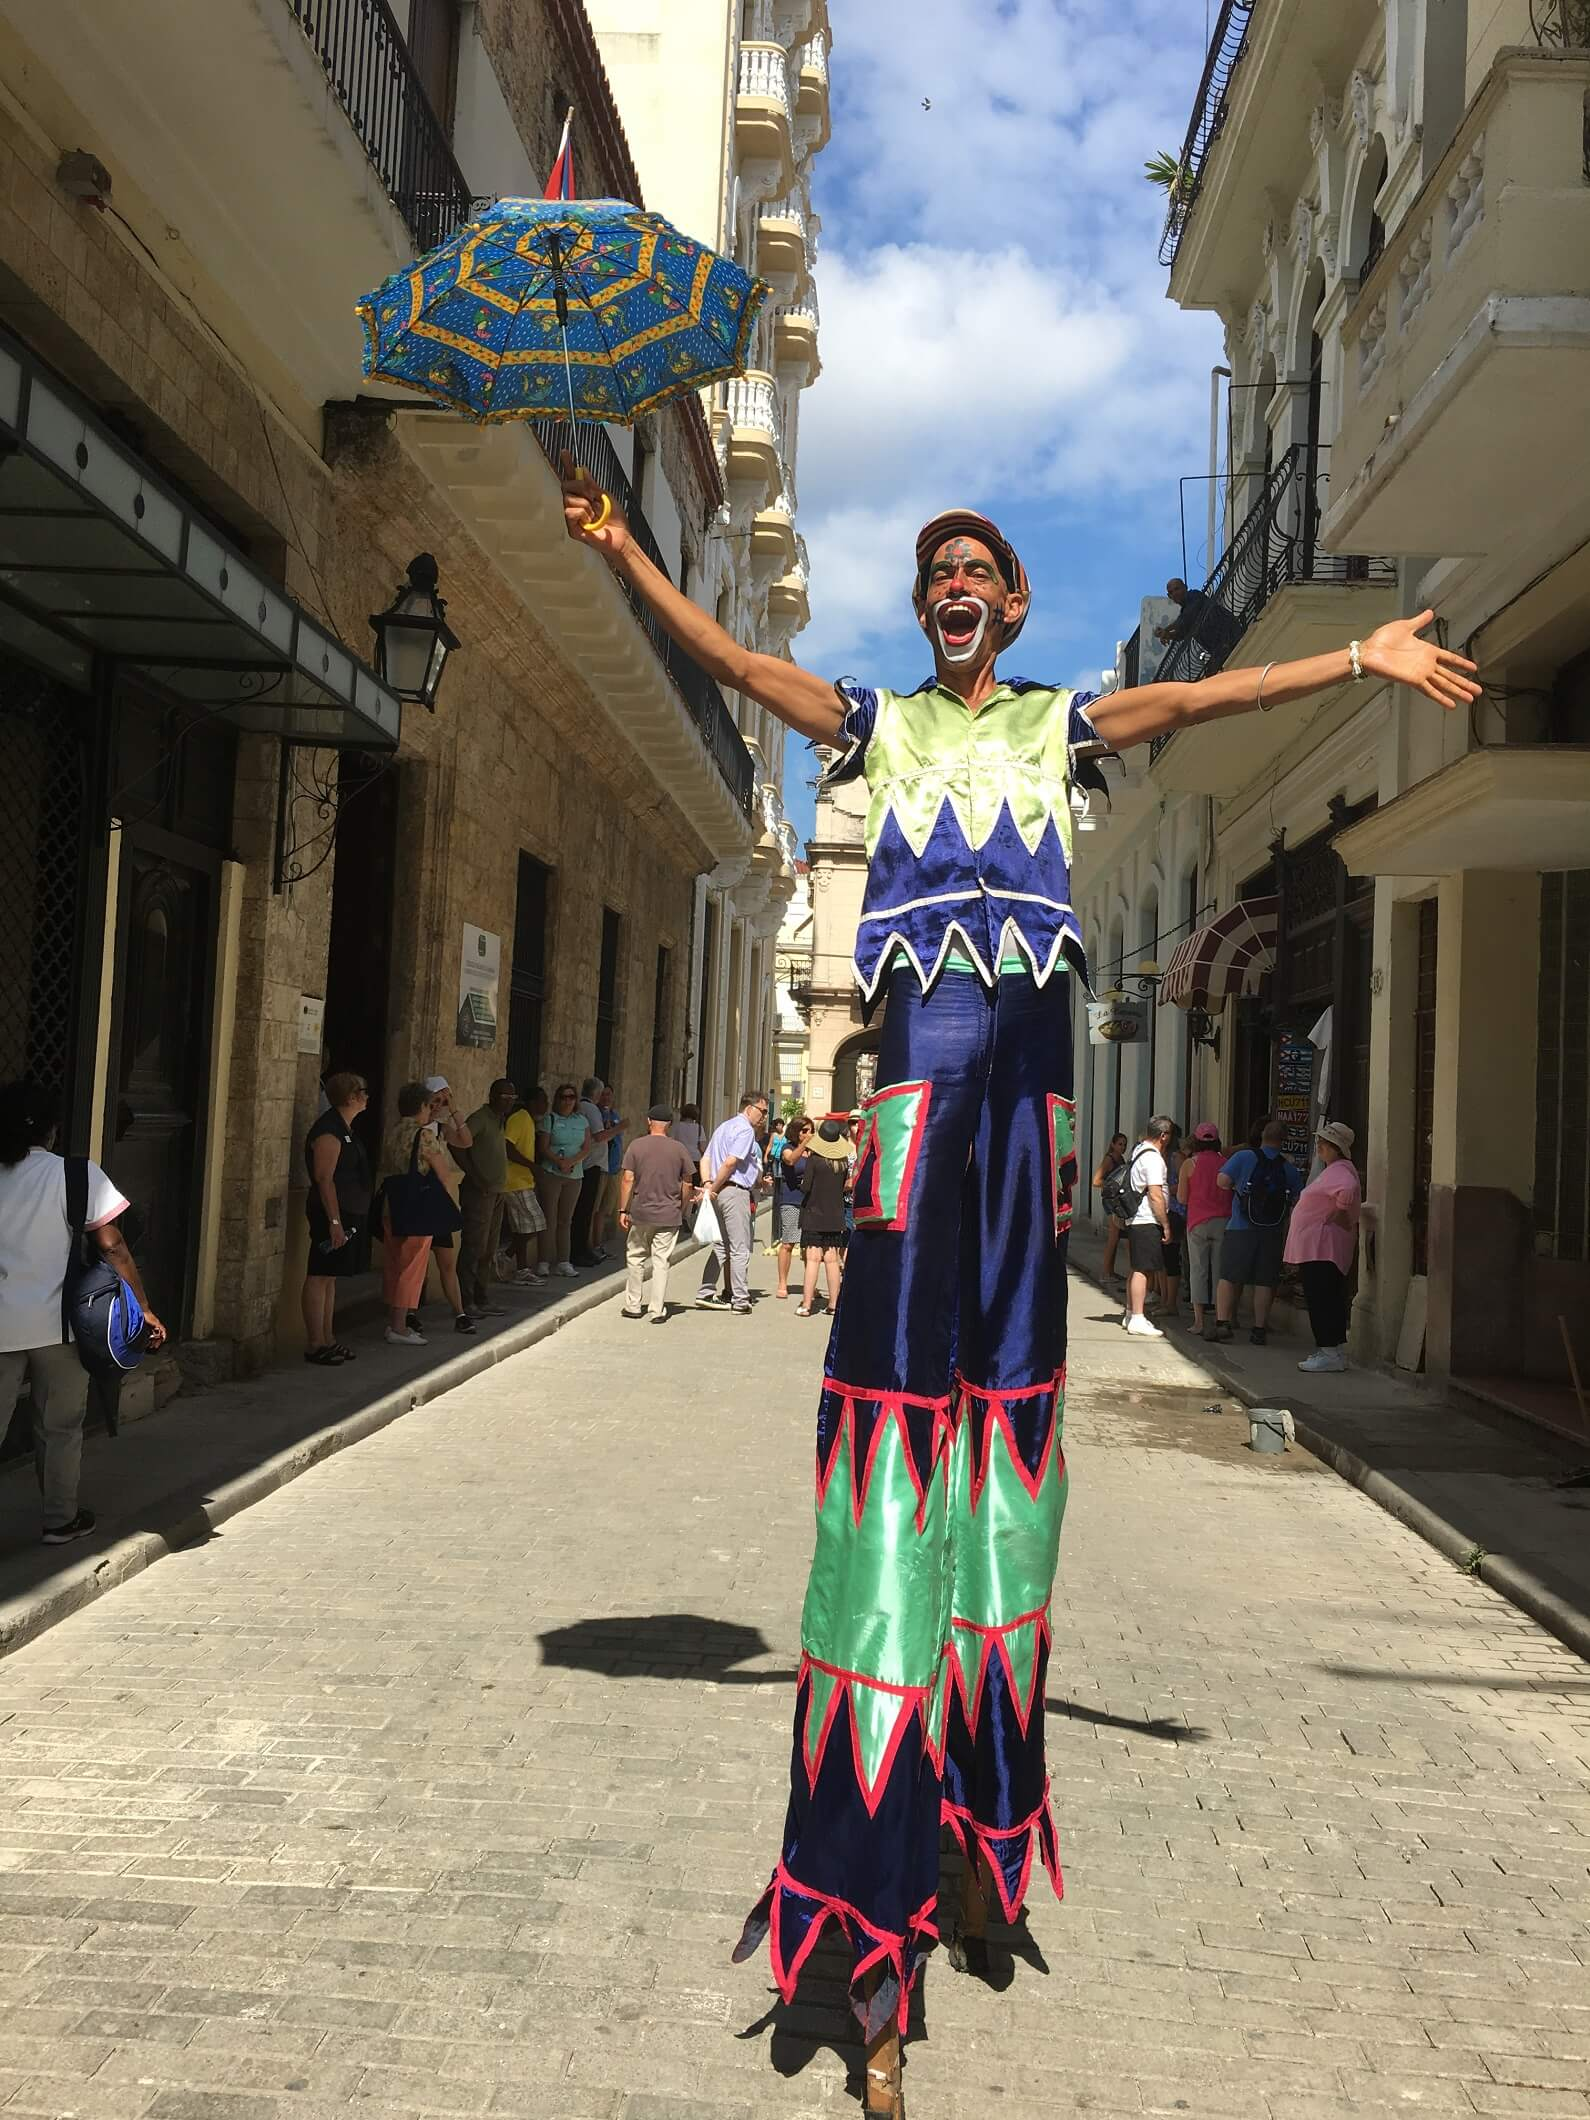 Visit Havana and see man on stilts in Havana street